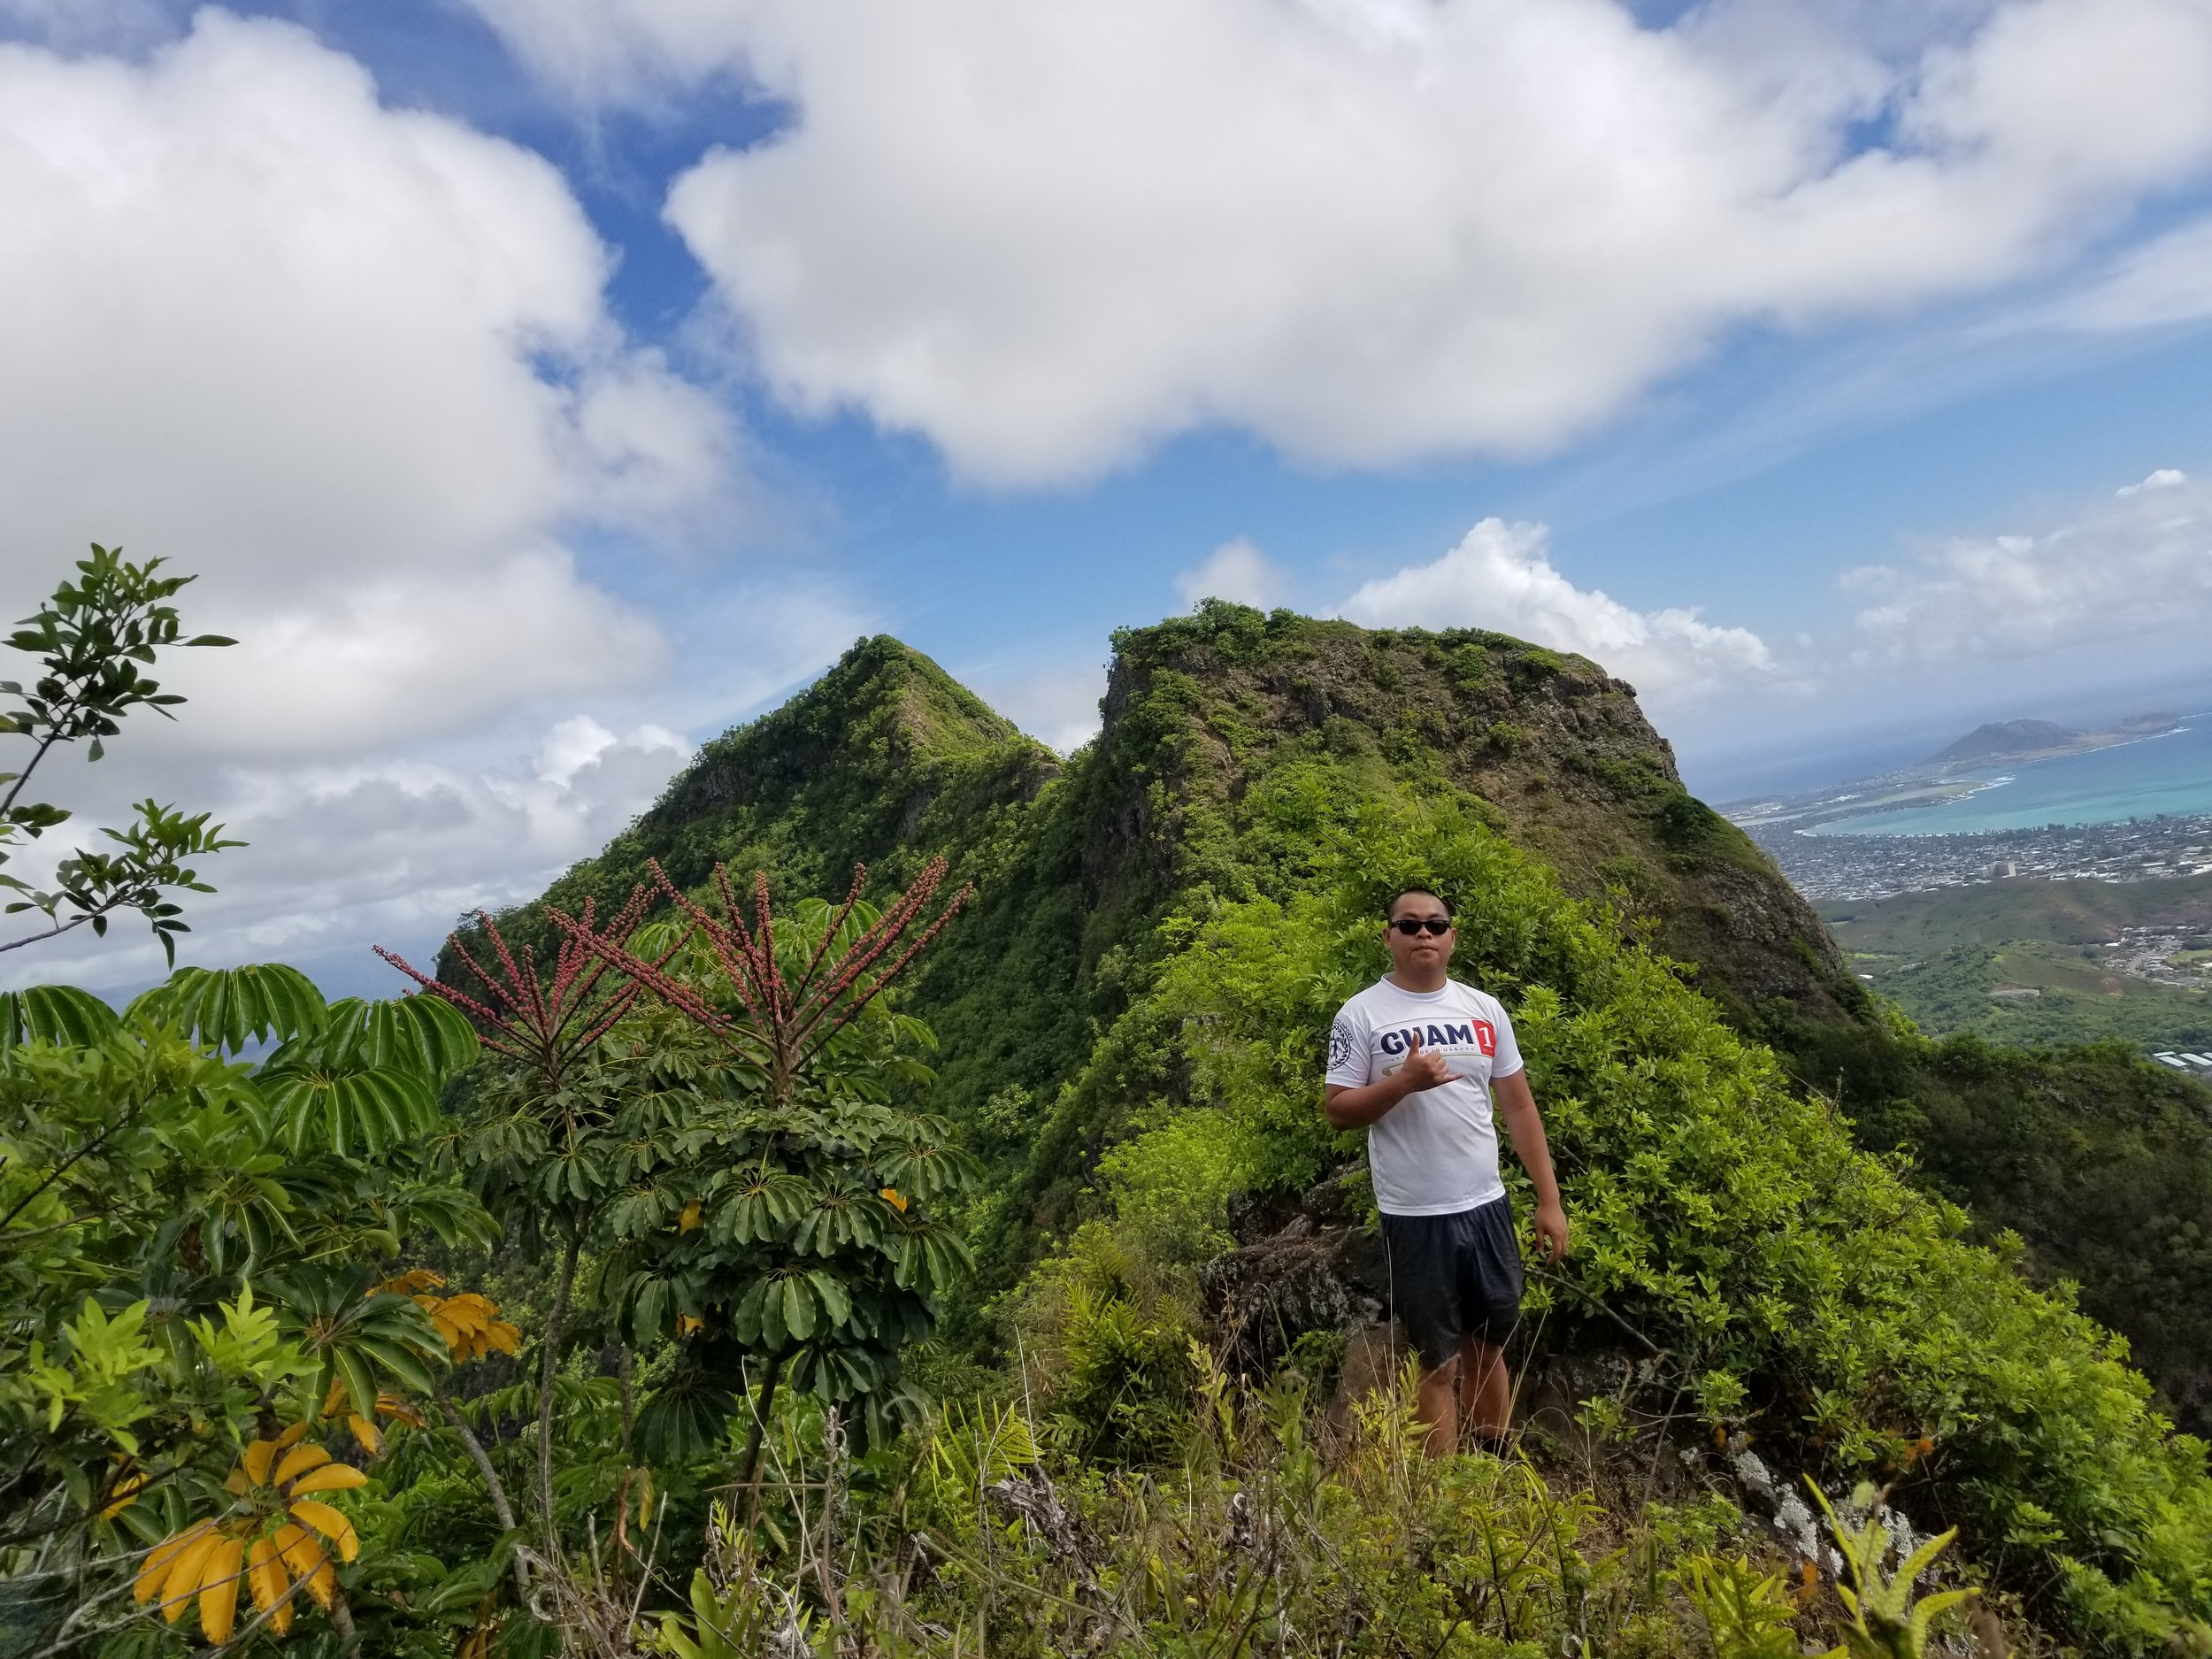 olomano-trail-hikes-in-oahu-polywander